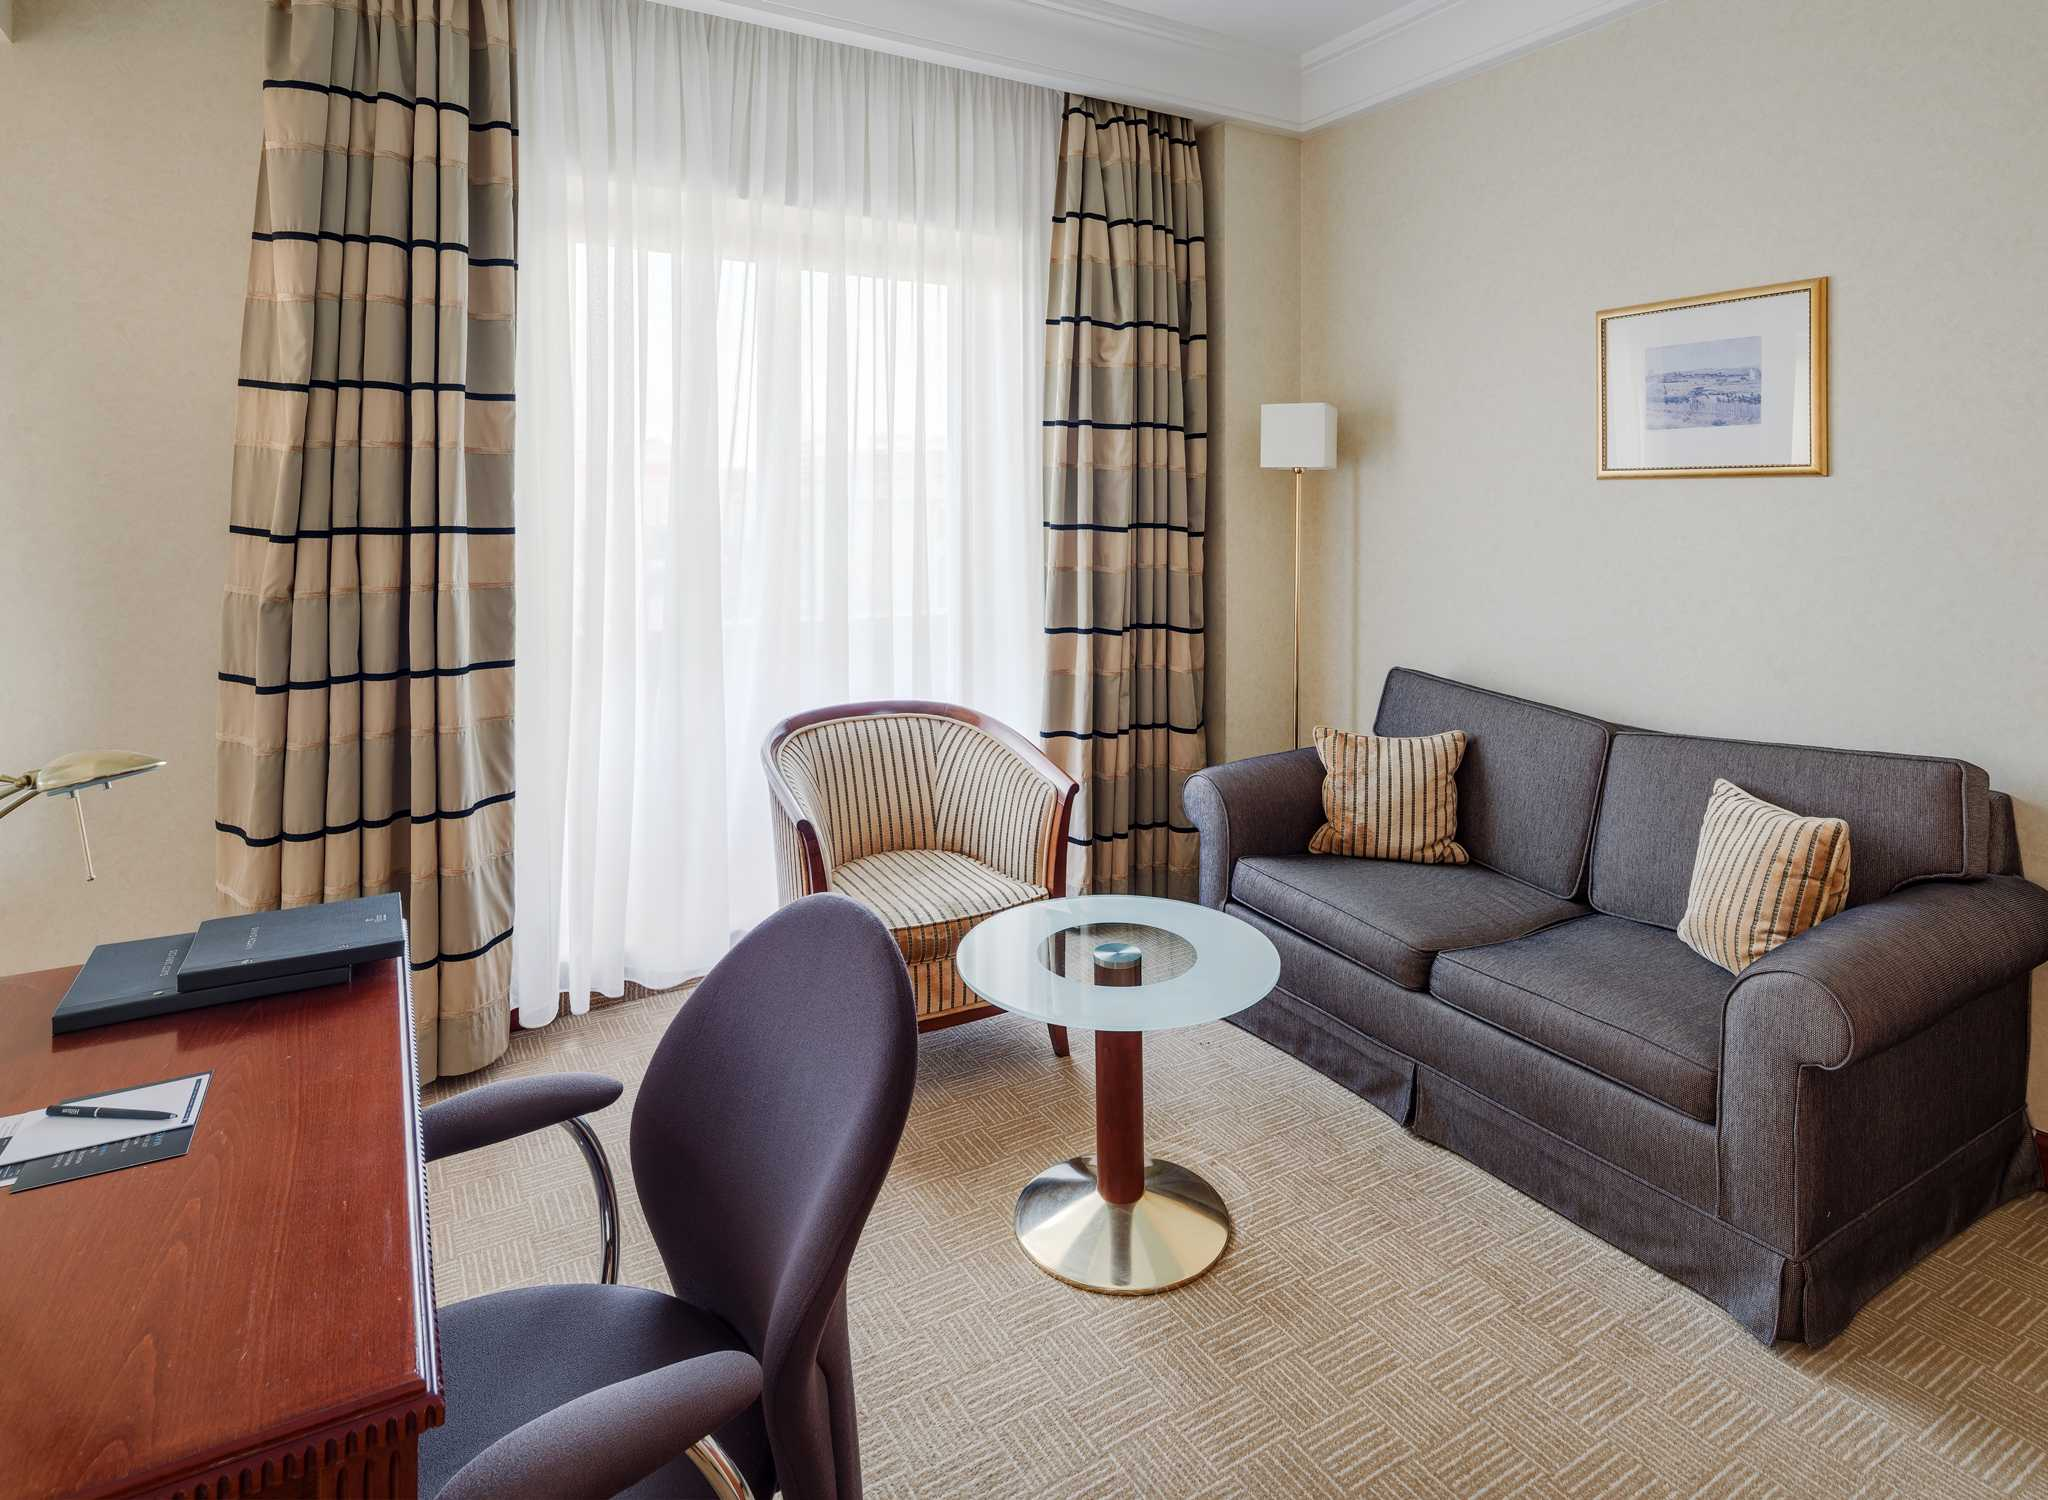 Wunderbar Athenee Palace Hilton Bucharest Hotel, Rumänien U2013 Junior Suite